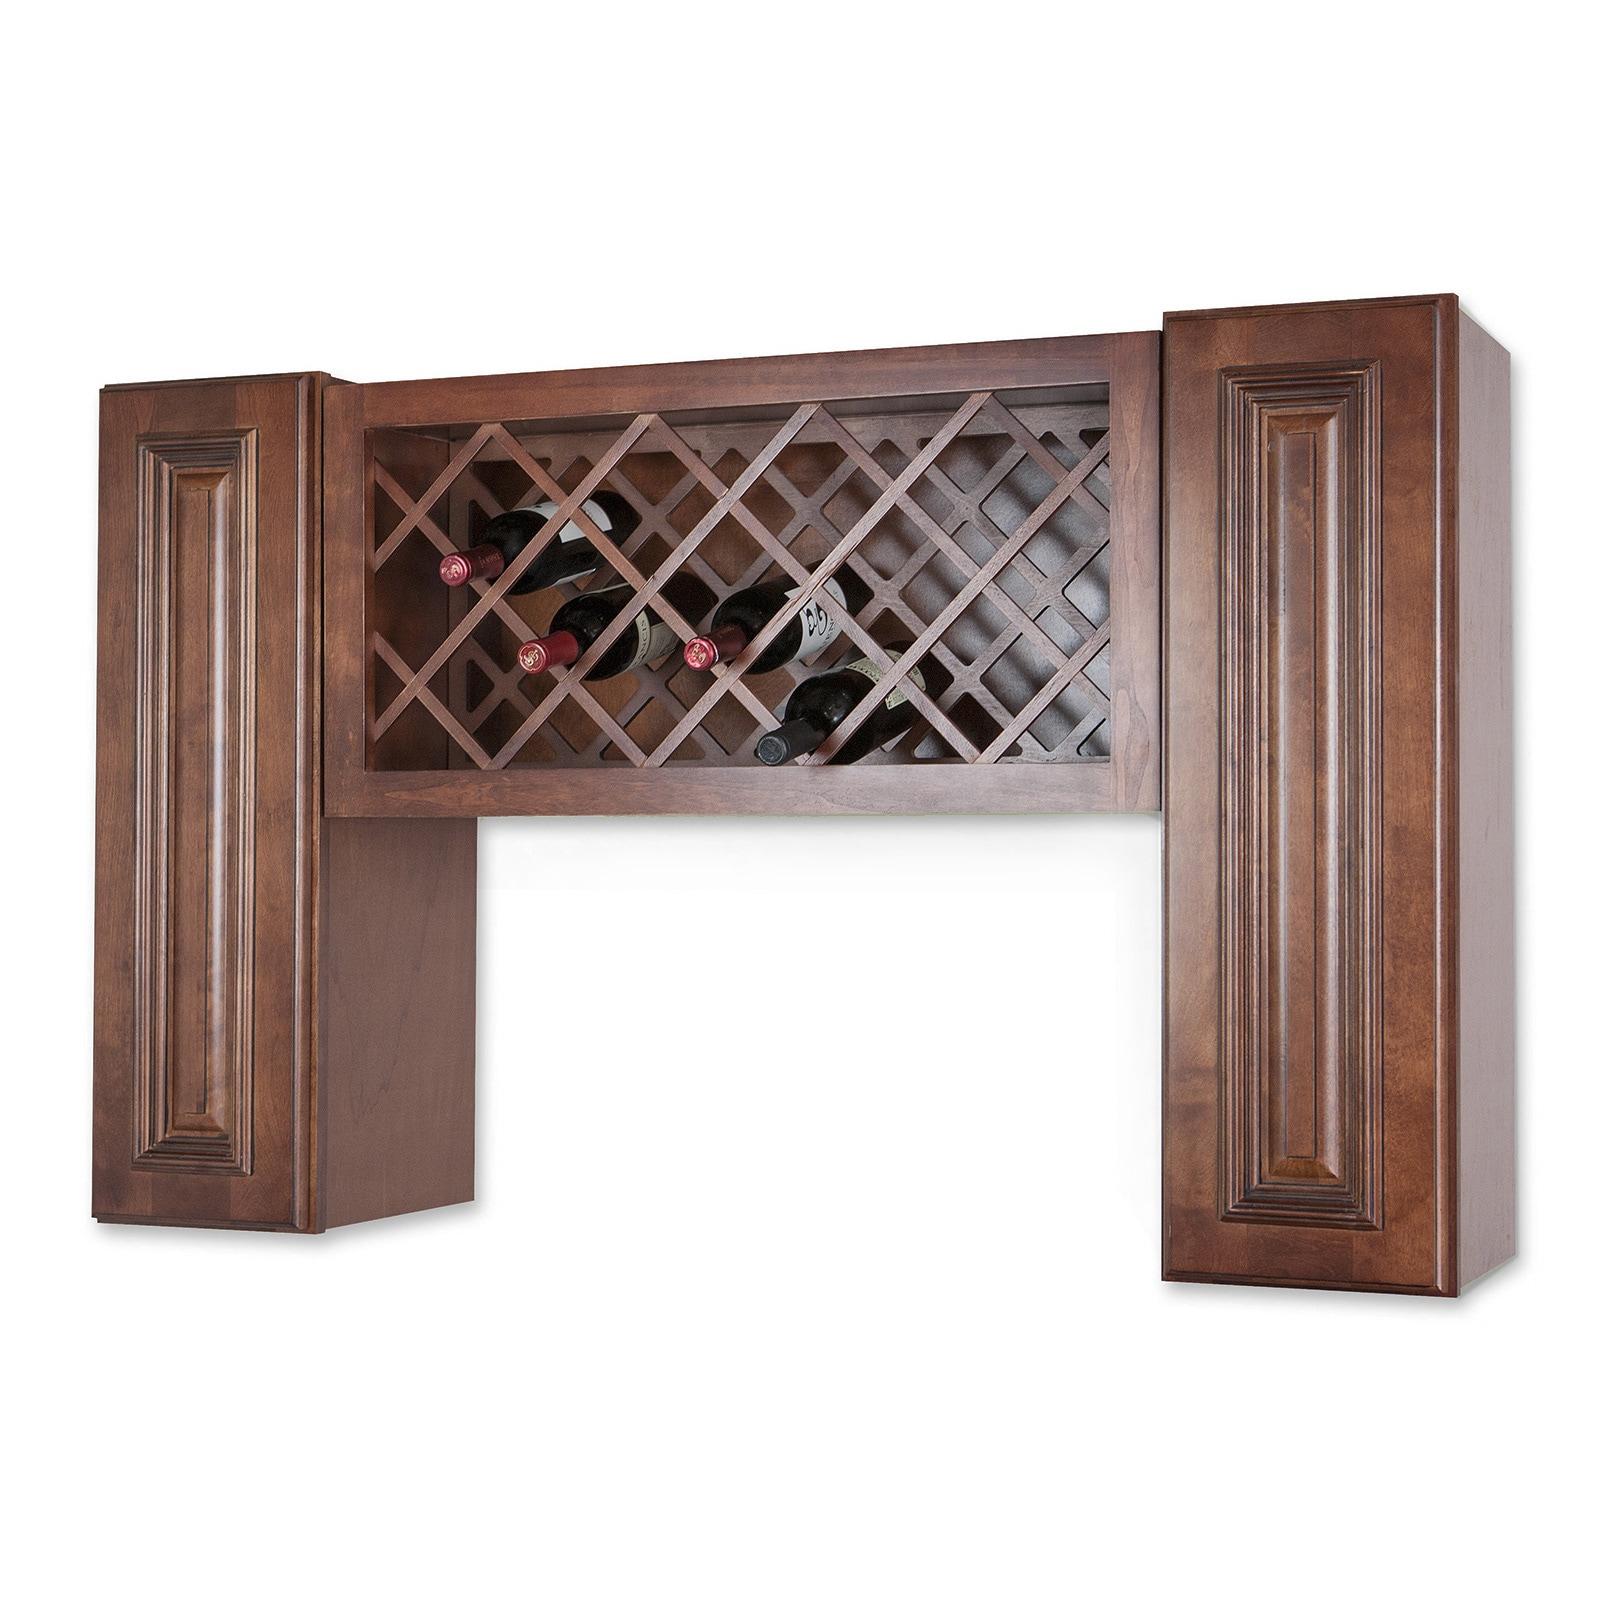 Wall Mount Wine Rack Cabinet Unit (Wine Rack), Brown